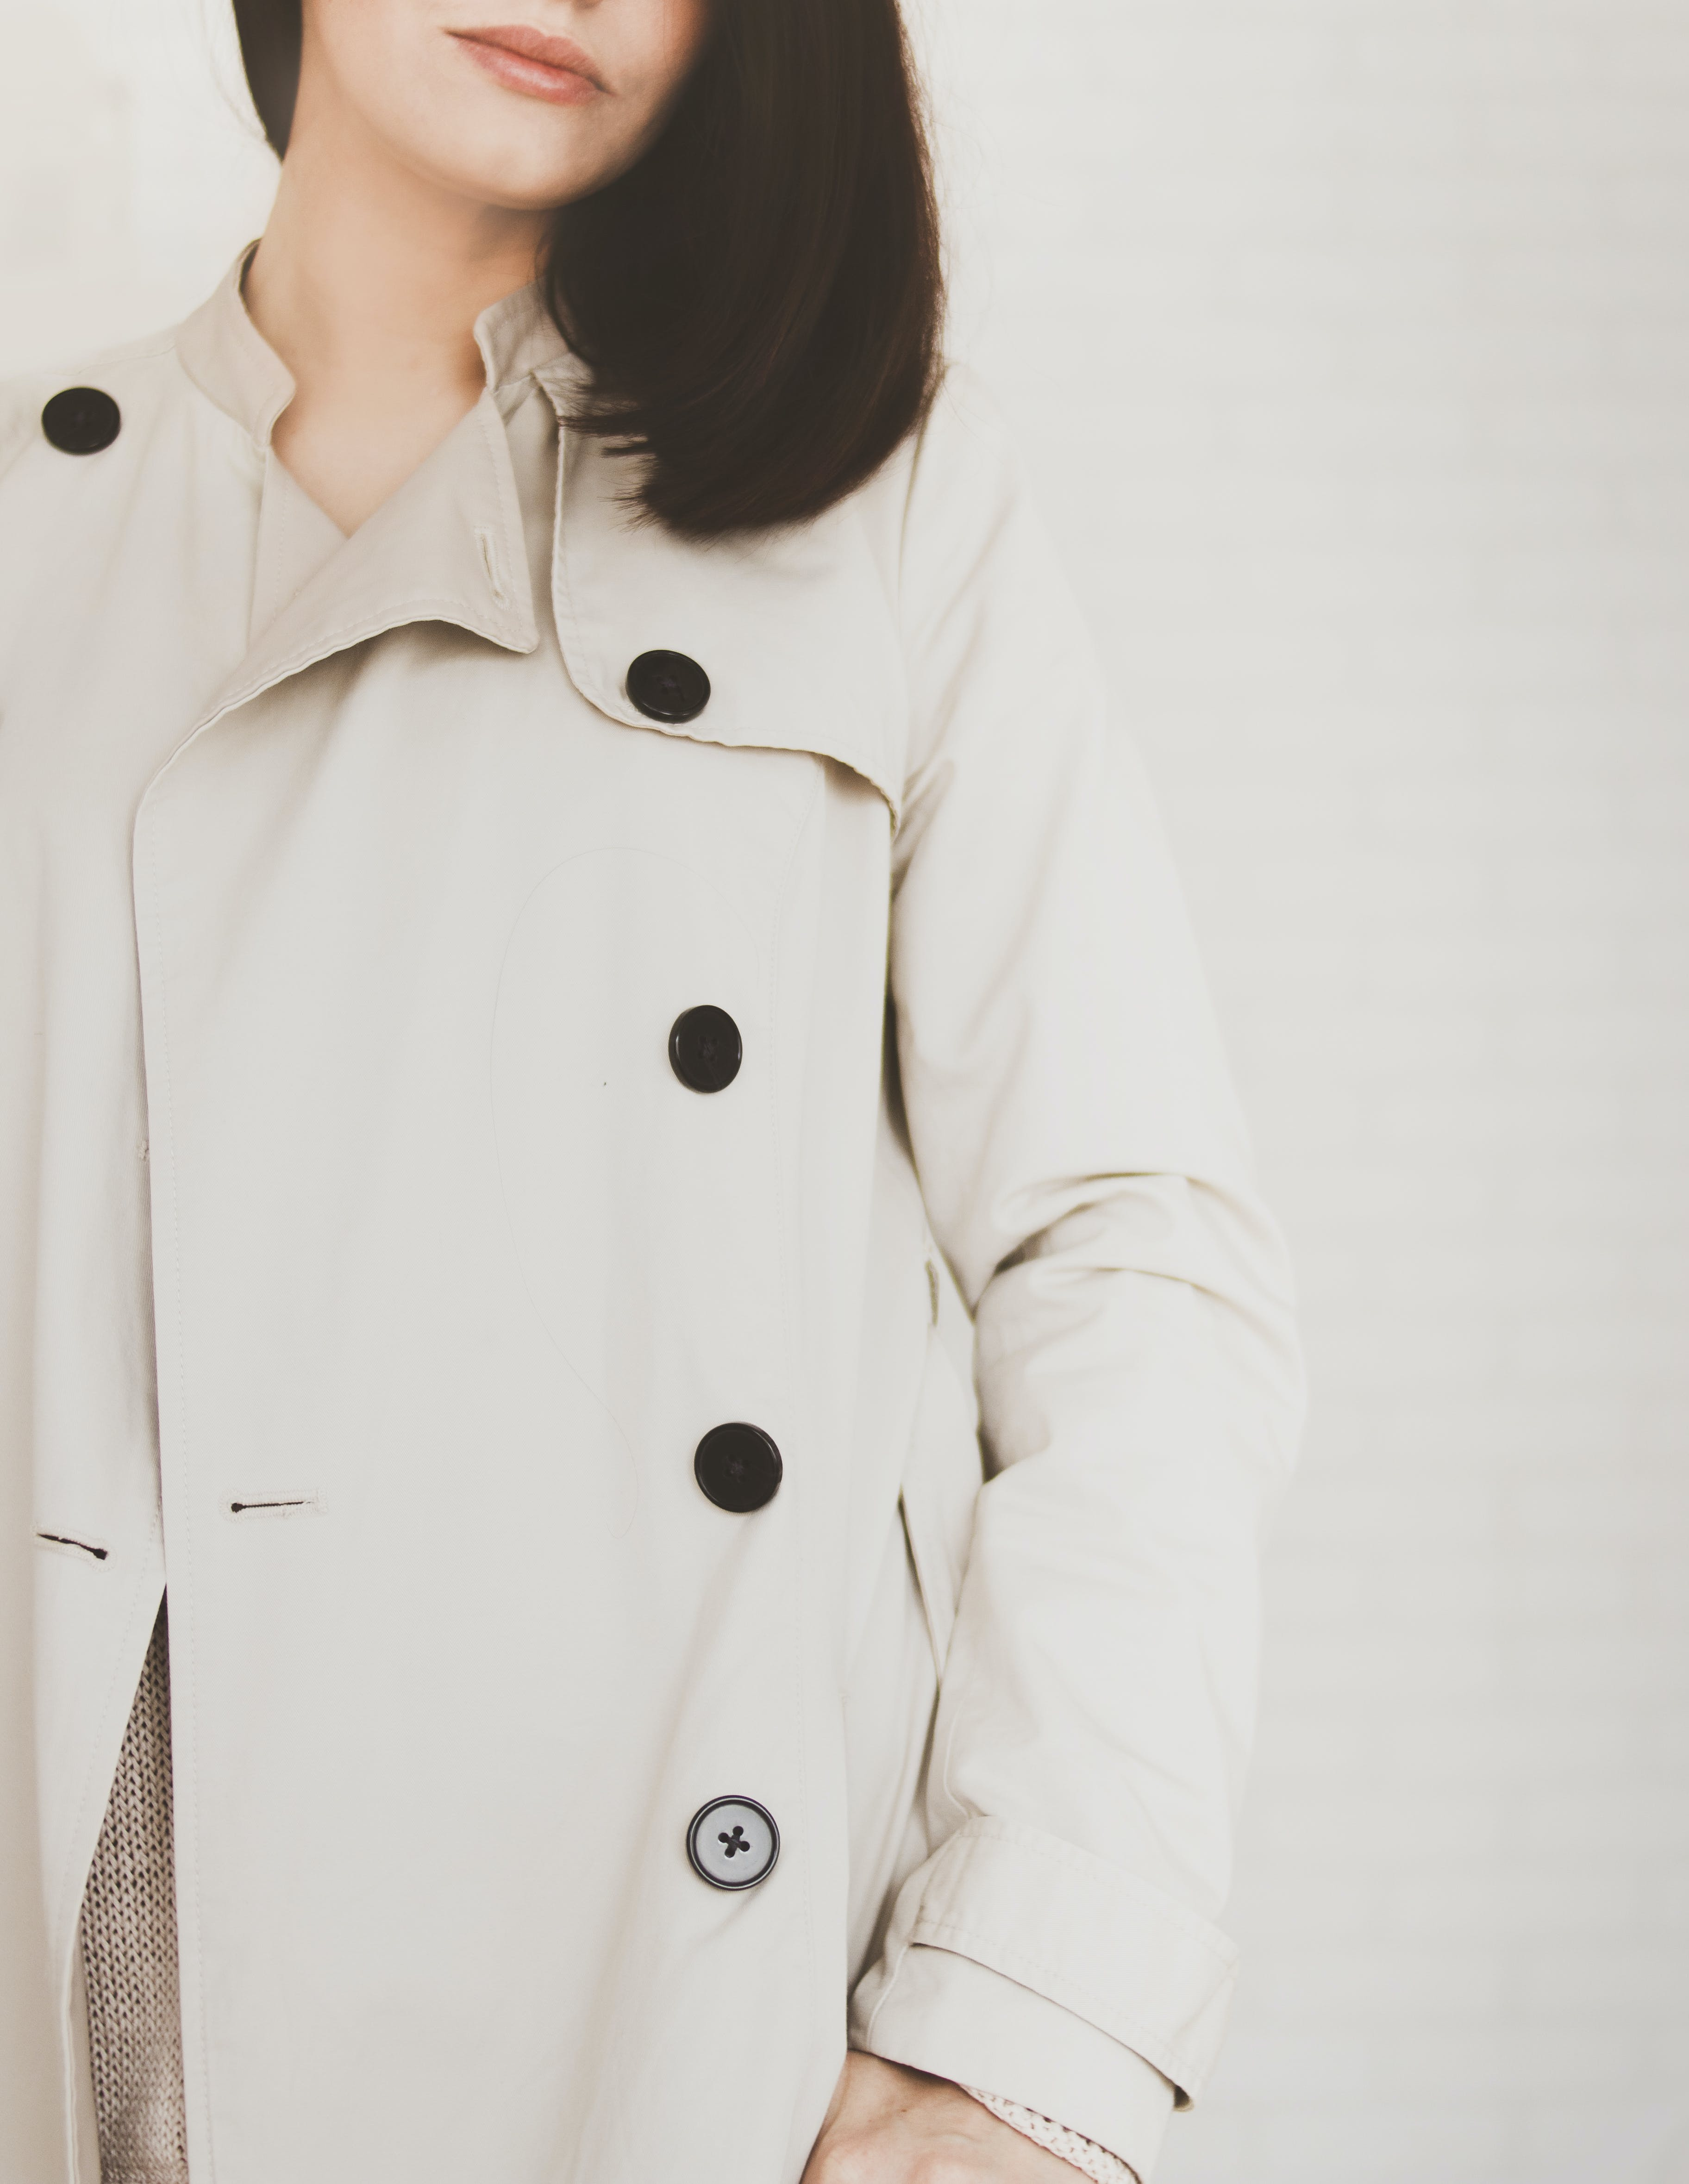 Kostenloses Stock Foto zu dame, drinnen, fashion, frau